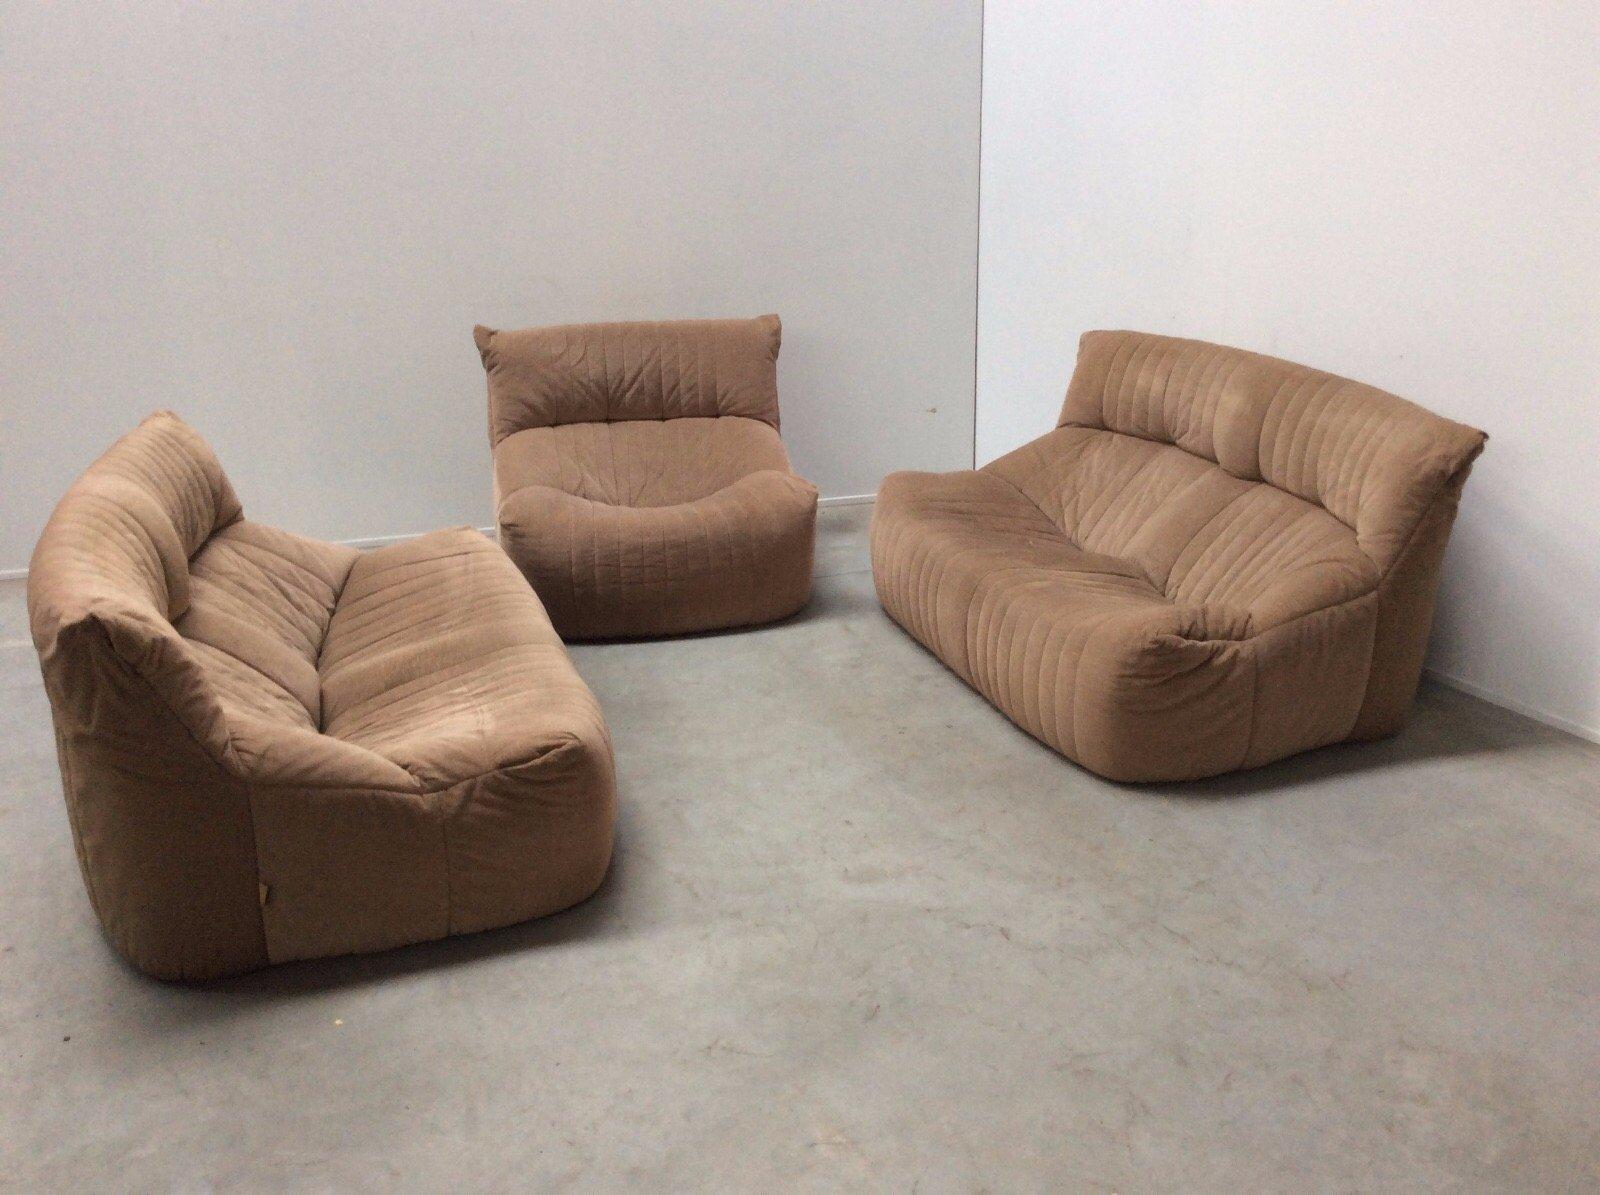 vintage aralia living room set with 2 sofas 1 armchair by michel ducaroy for ligne roset for. Black Bedroom Furniture Sets. Home Design Ideas